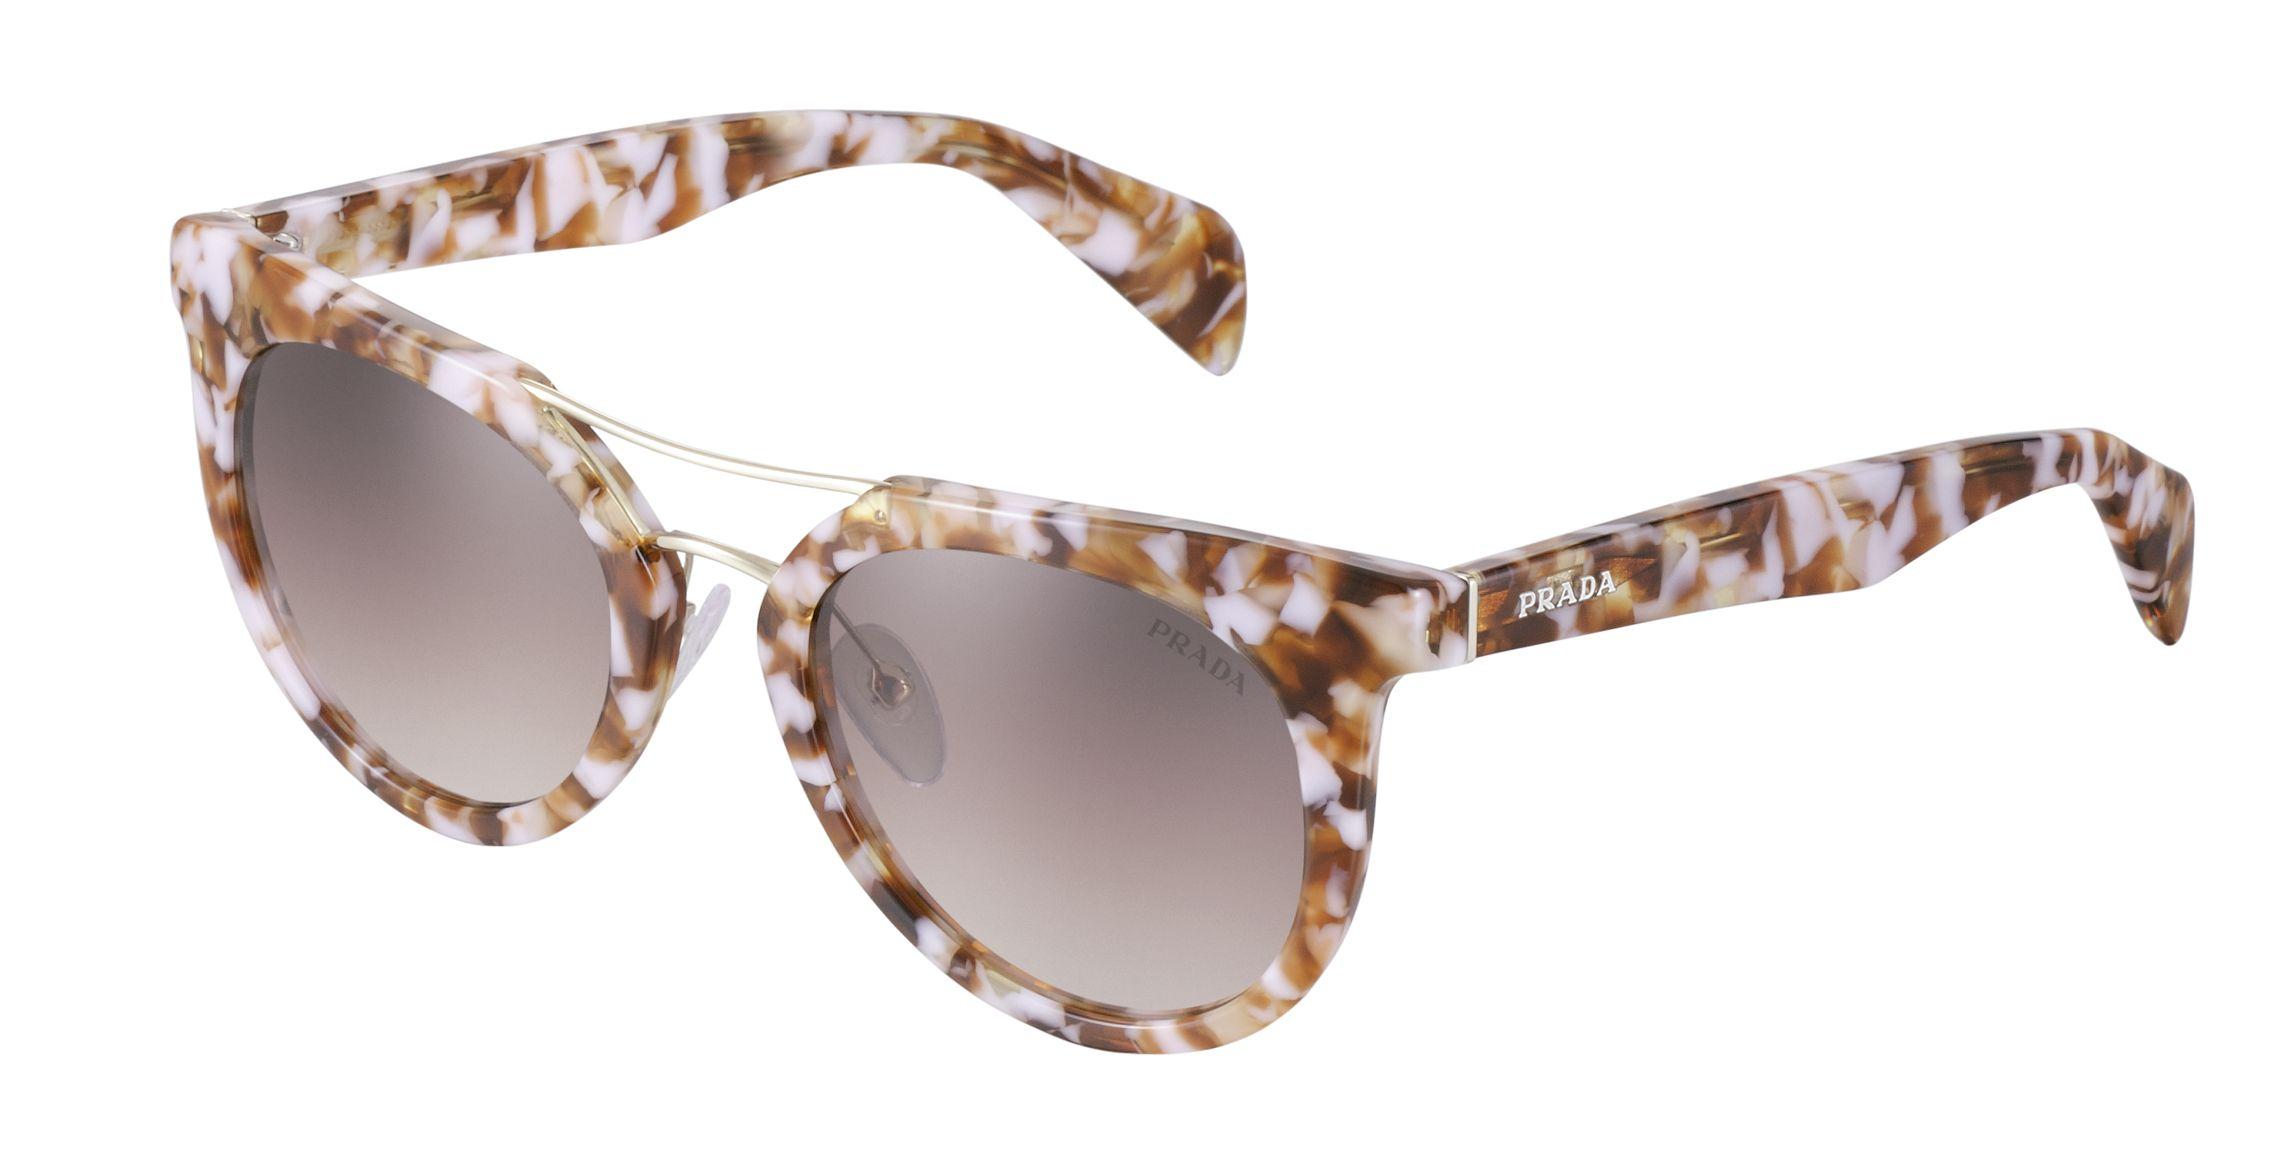 b4d5201e878 Prada printed sunglasses. California Dreamin. TENMAG fashion magazine Junio  2013